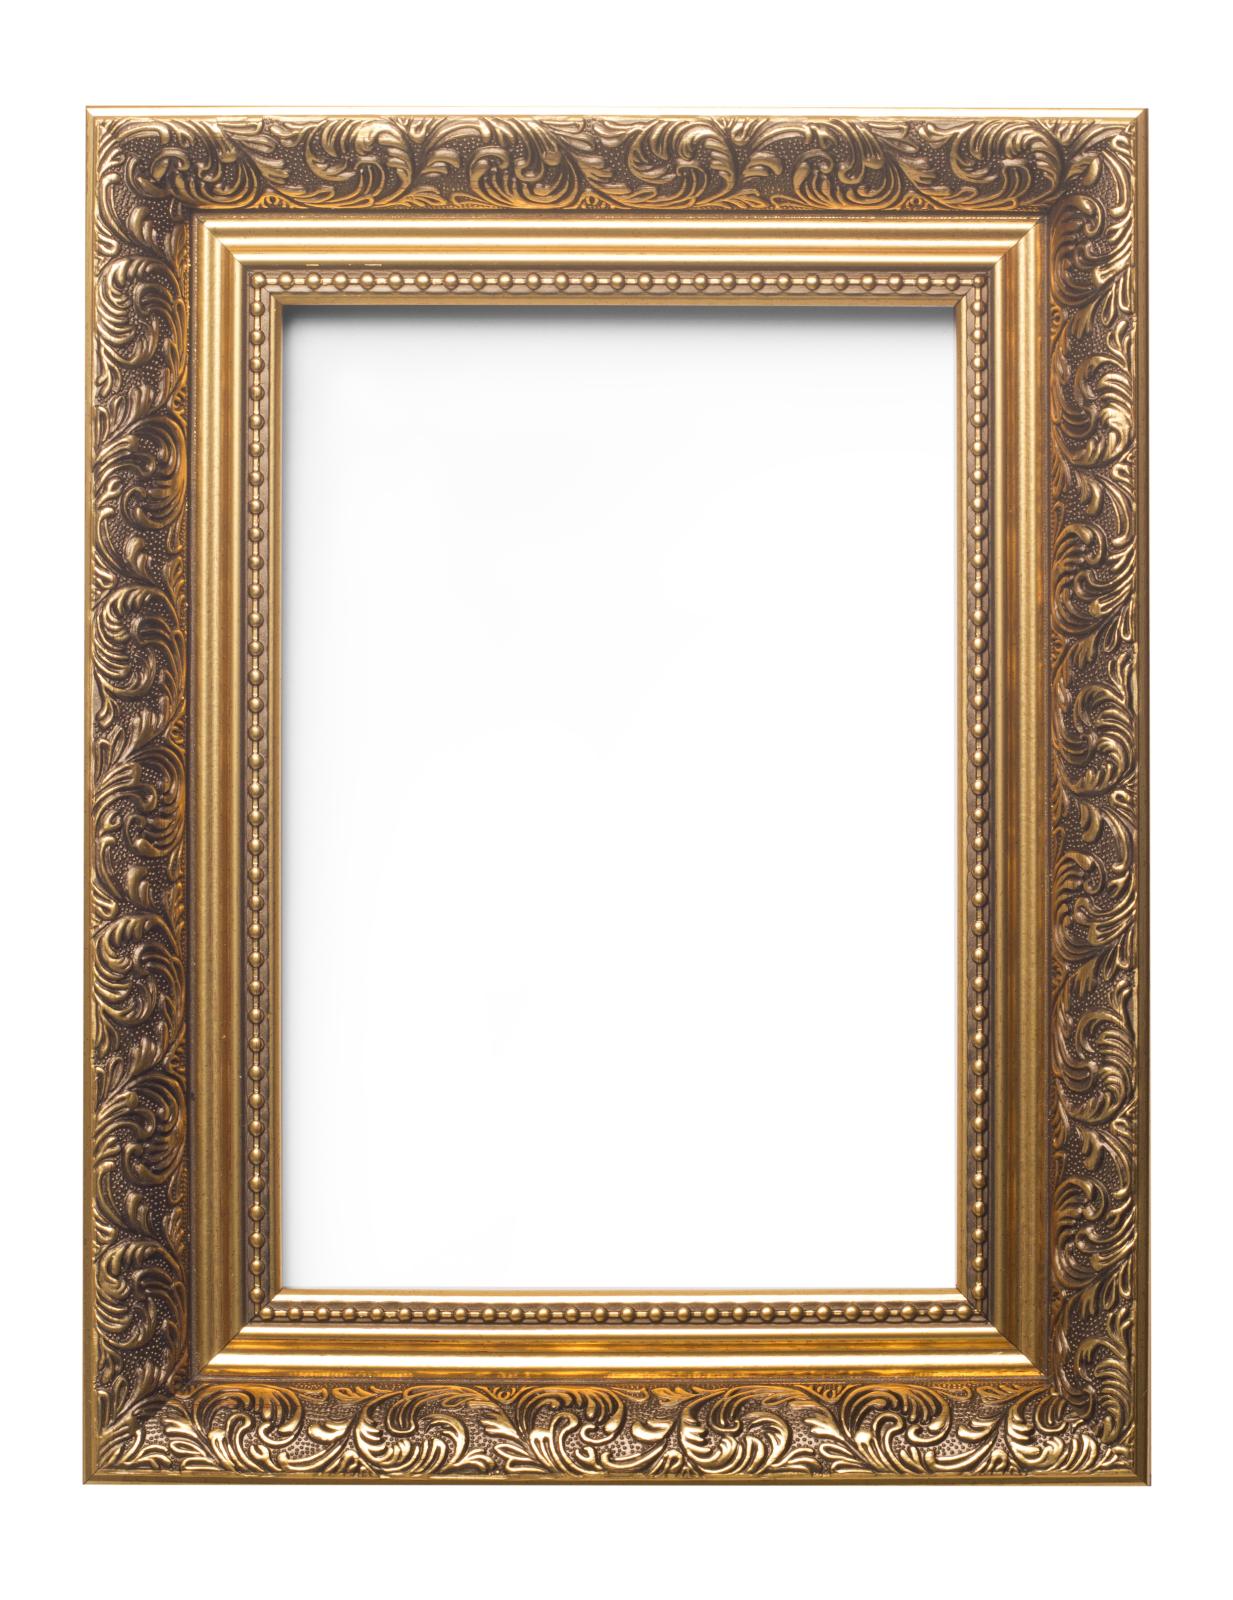 Kunstvoll Antiker Stil Bilderrahmen Bilderrahmen Französisch Barock ...